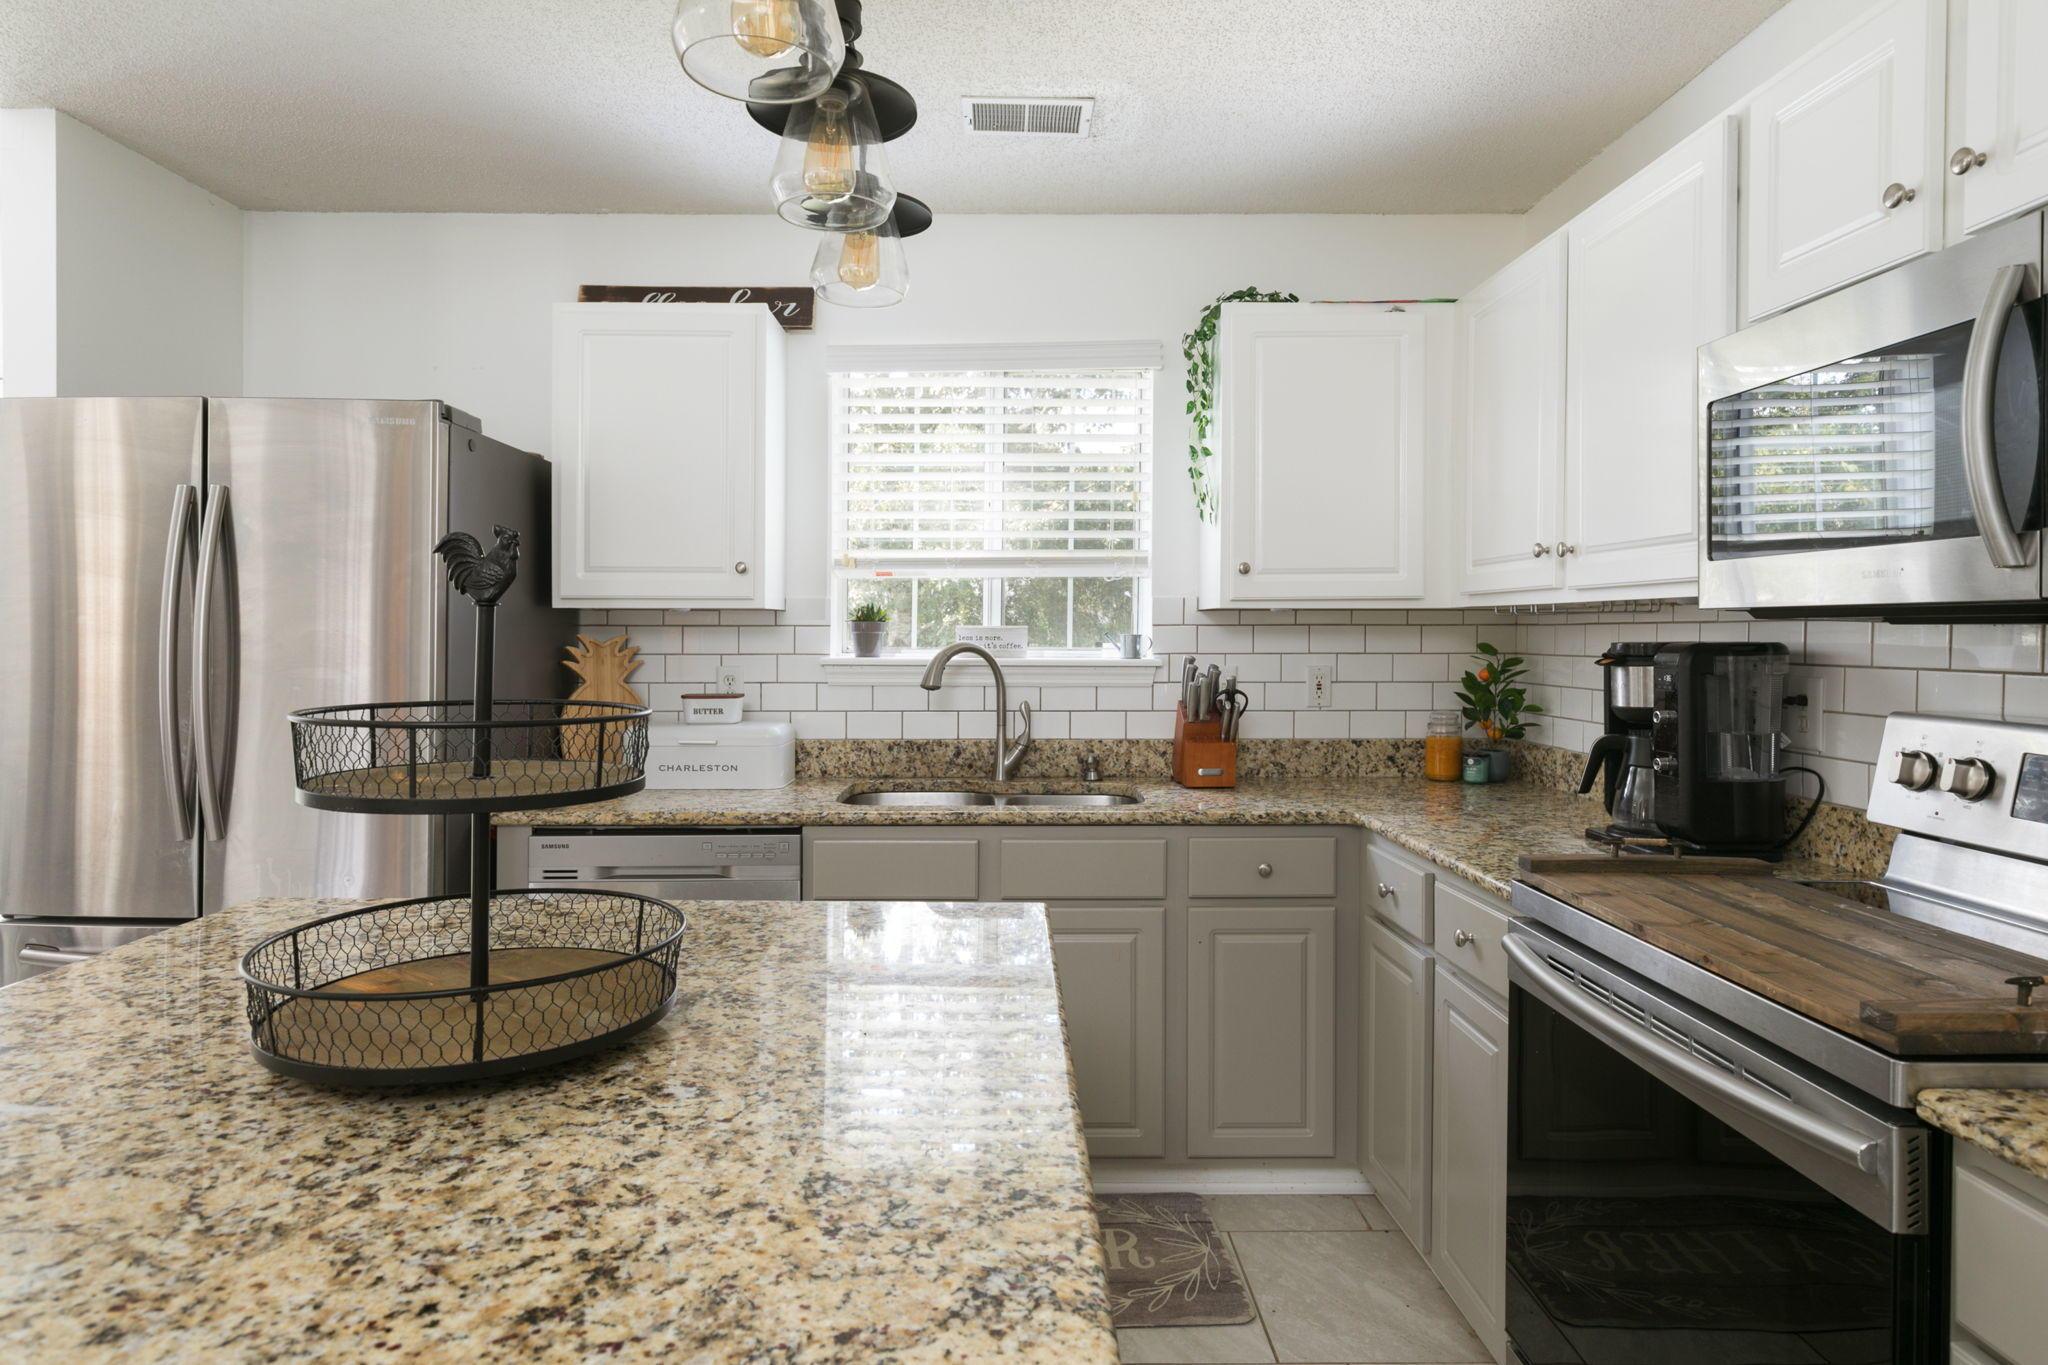 Bridges of Summerville Homes For Sale - 25 Regency Oaks, Summerville, SC - 14